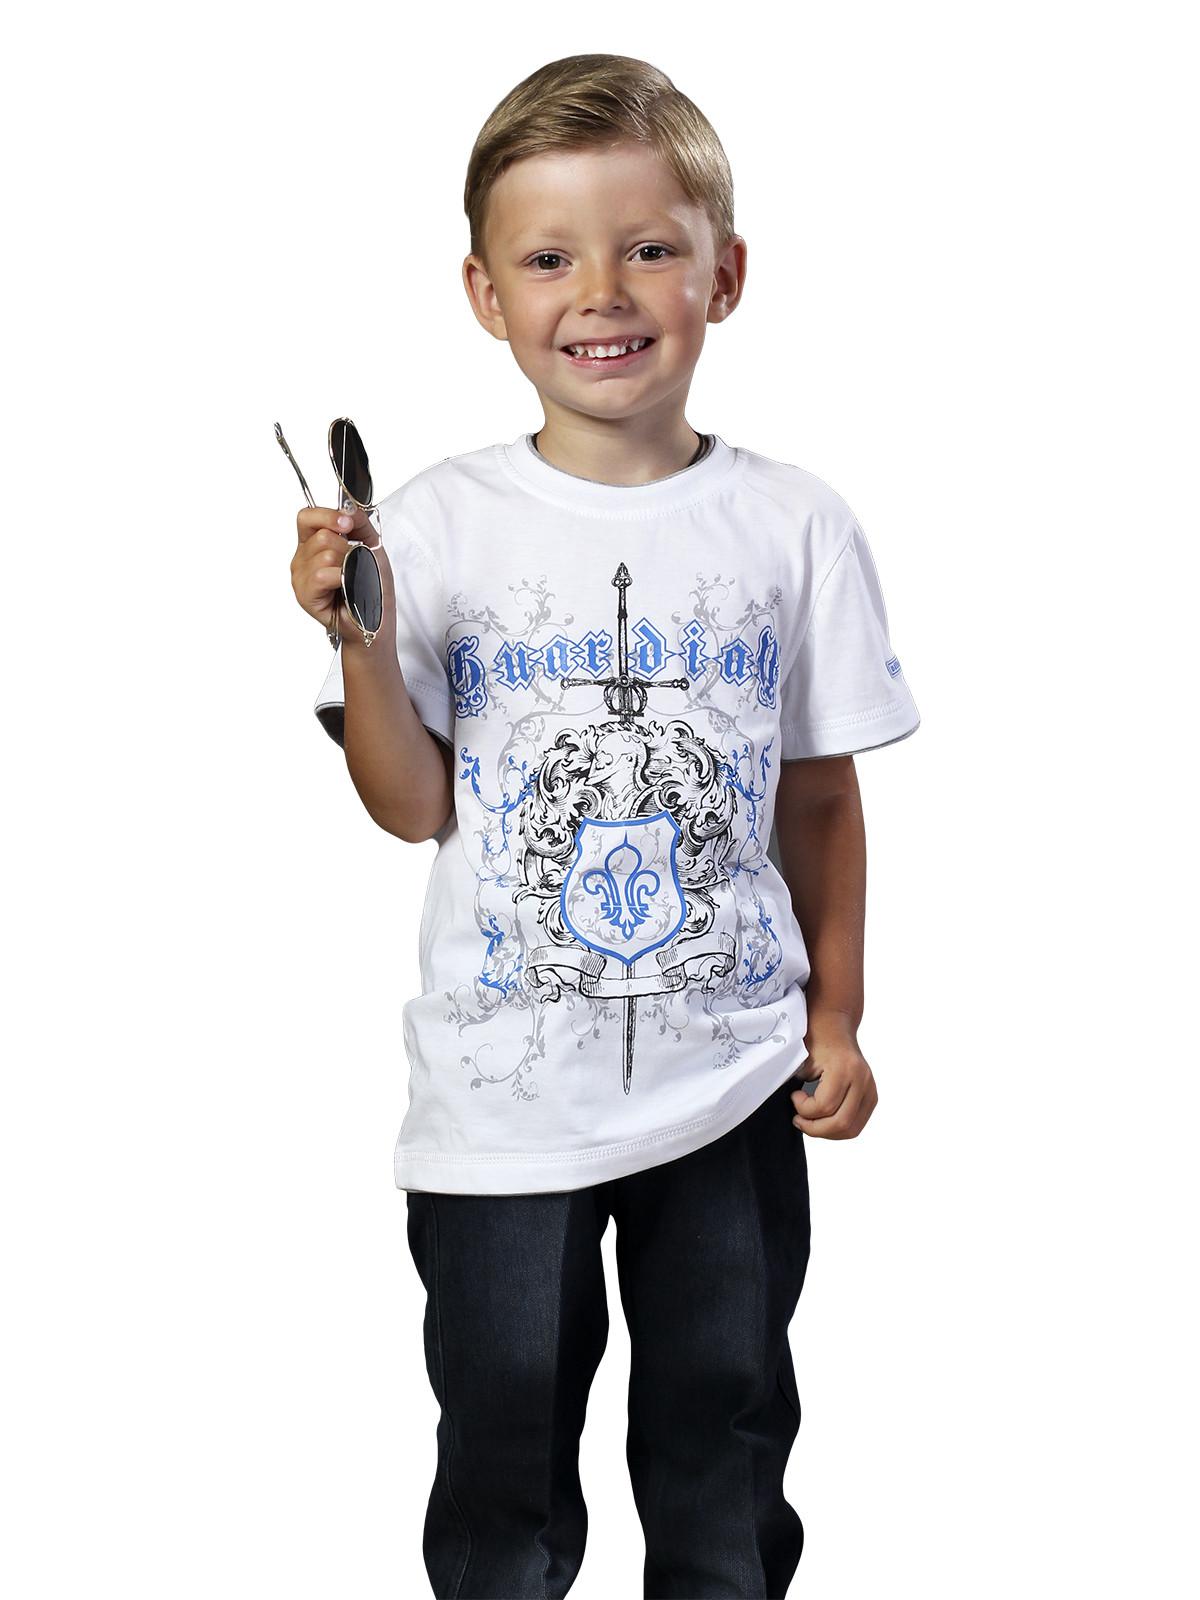 Футболка детская, арт.06ф, возраст от 7 до 10 лет